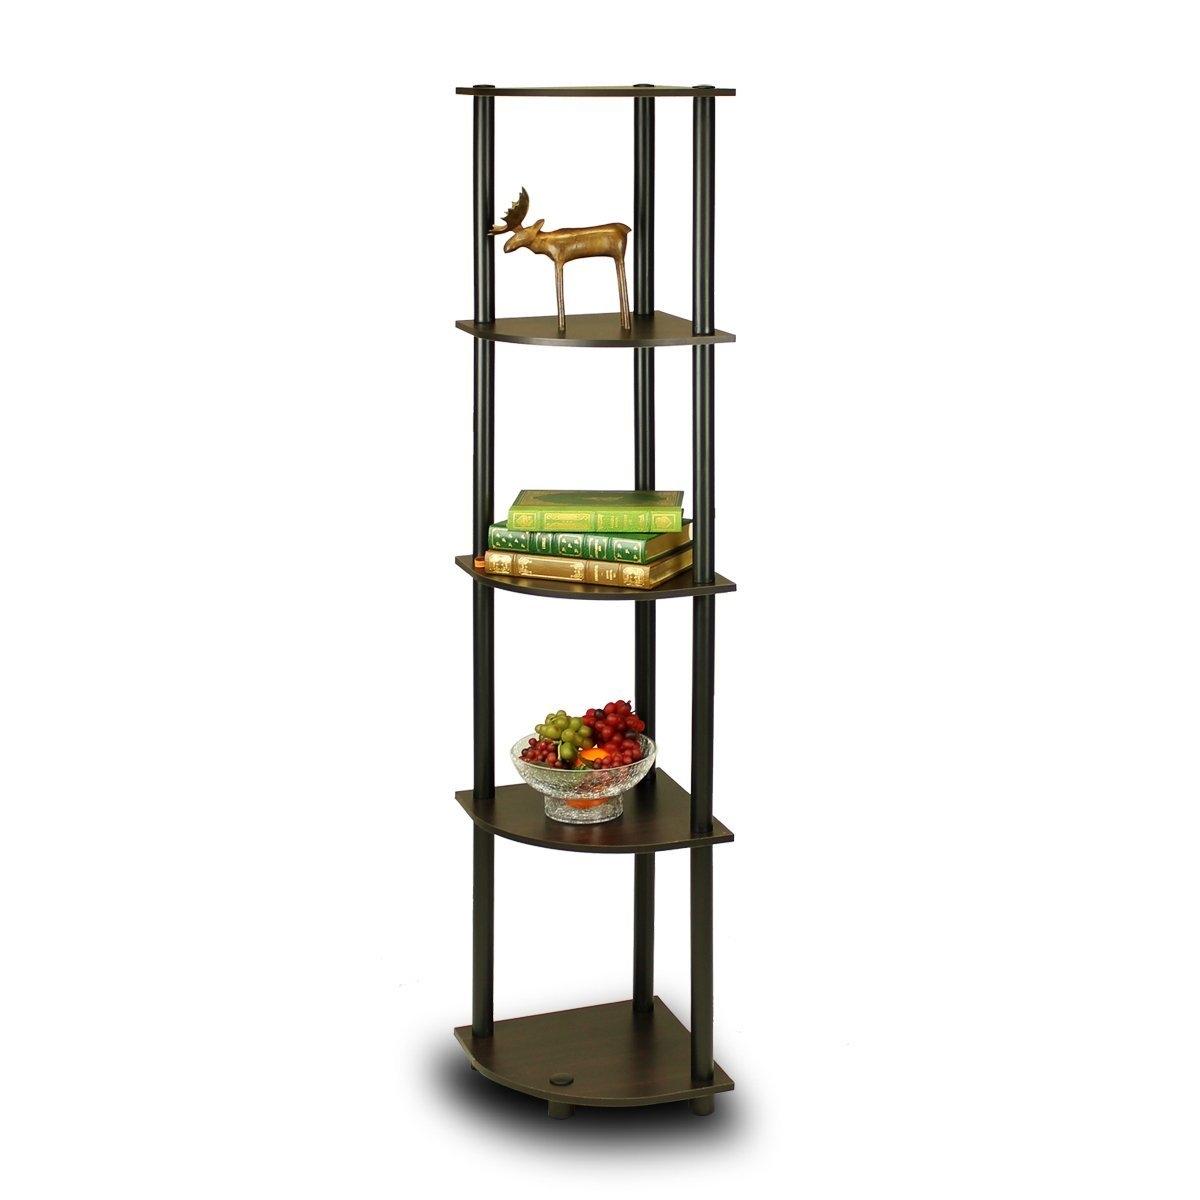 5-Tier Corner Display Shelf Bookcase in Espresso & Black